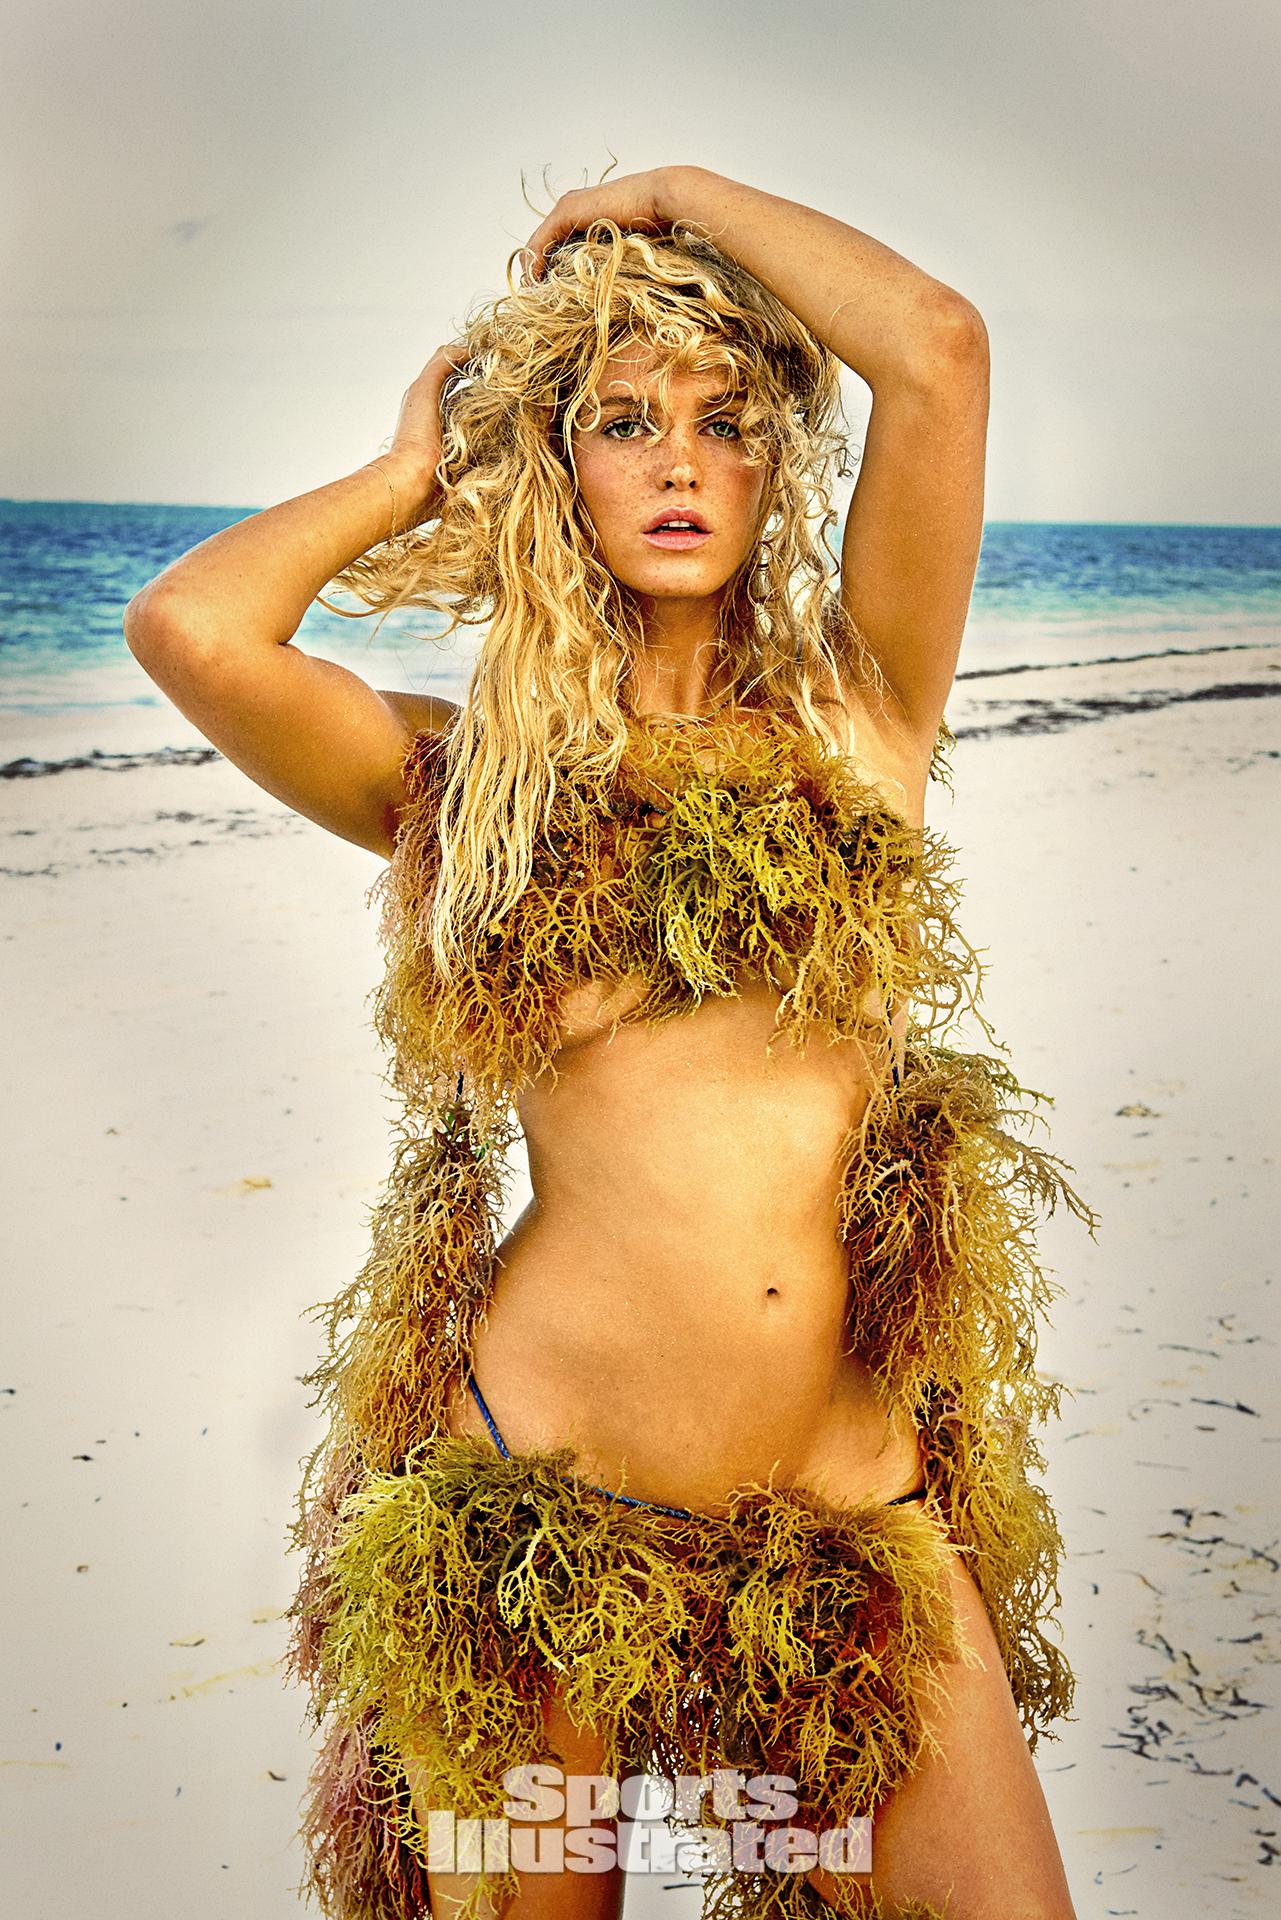 Erin Heatherton was photographed by Ruven Afanador in Zanzibar.